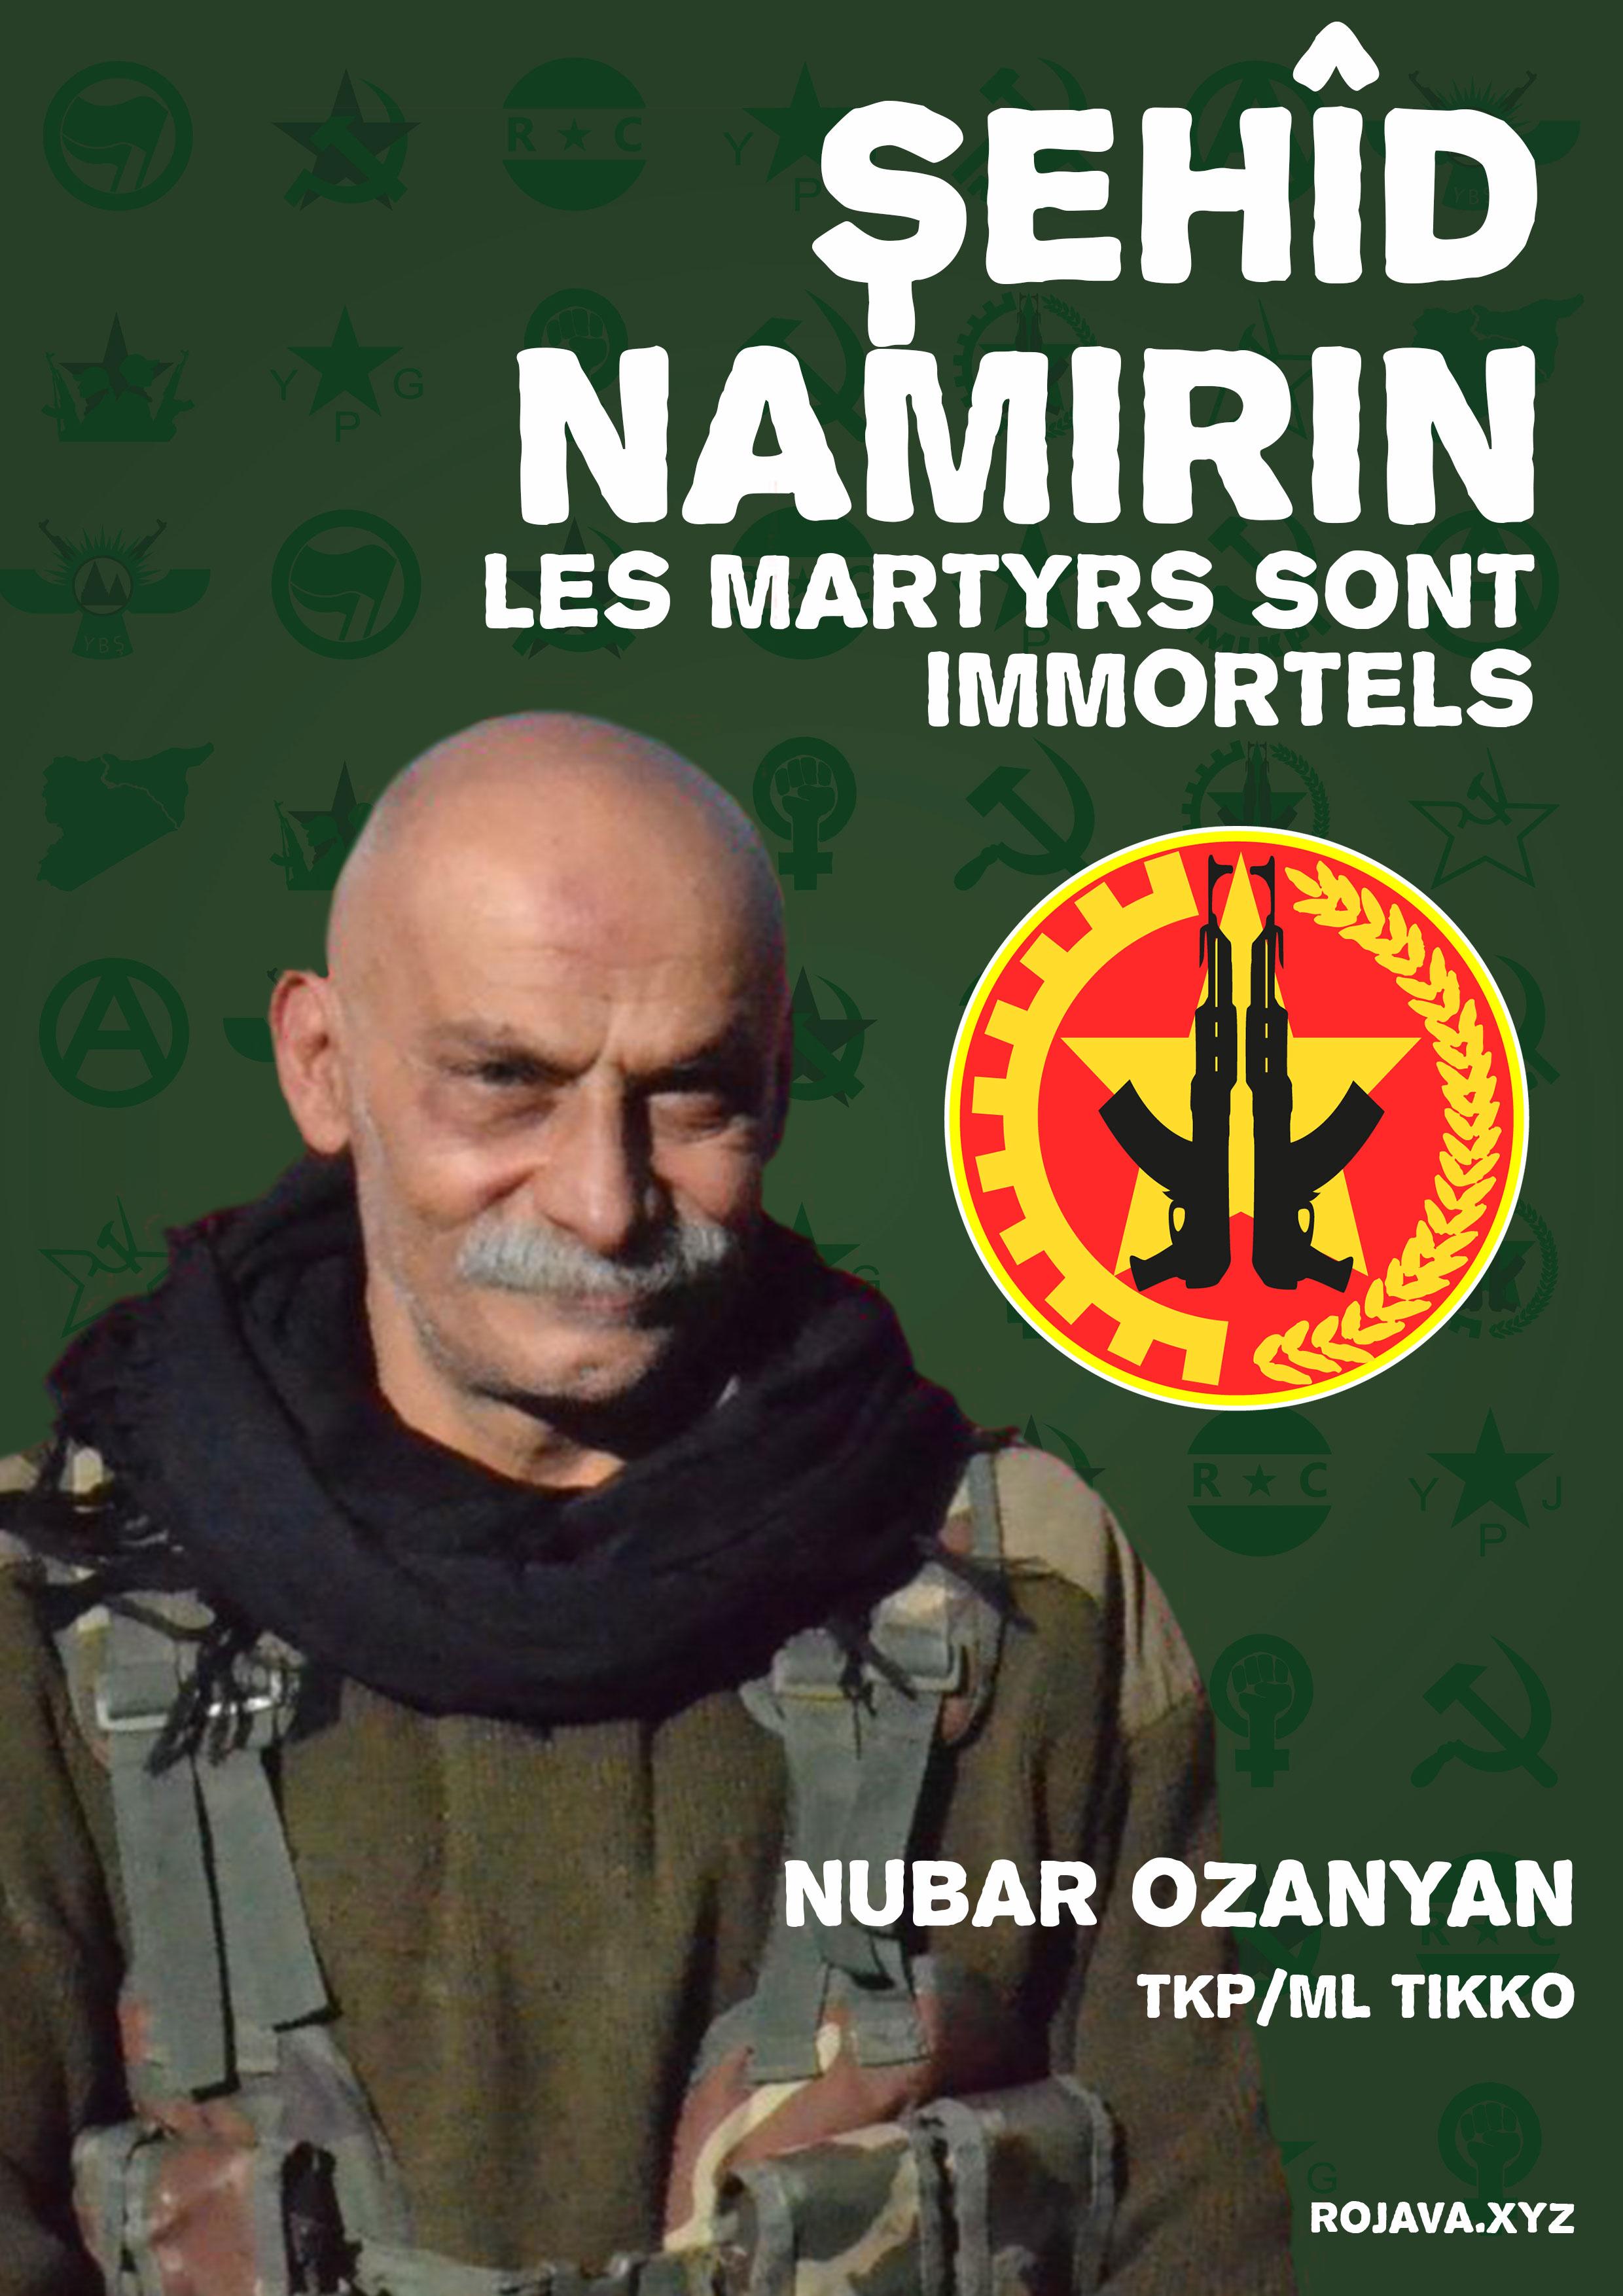 Nubar Ozanyan, martyr de Tikko